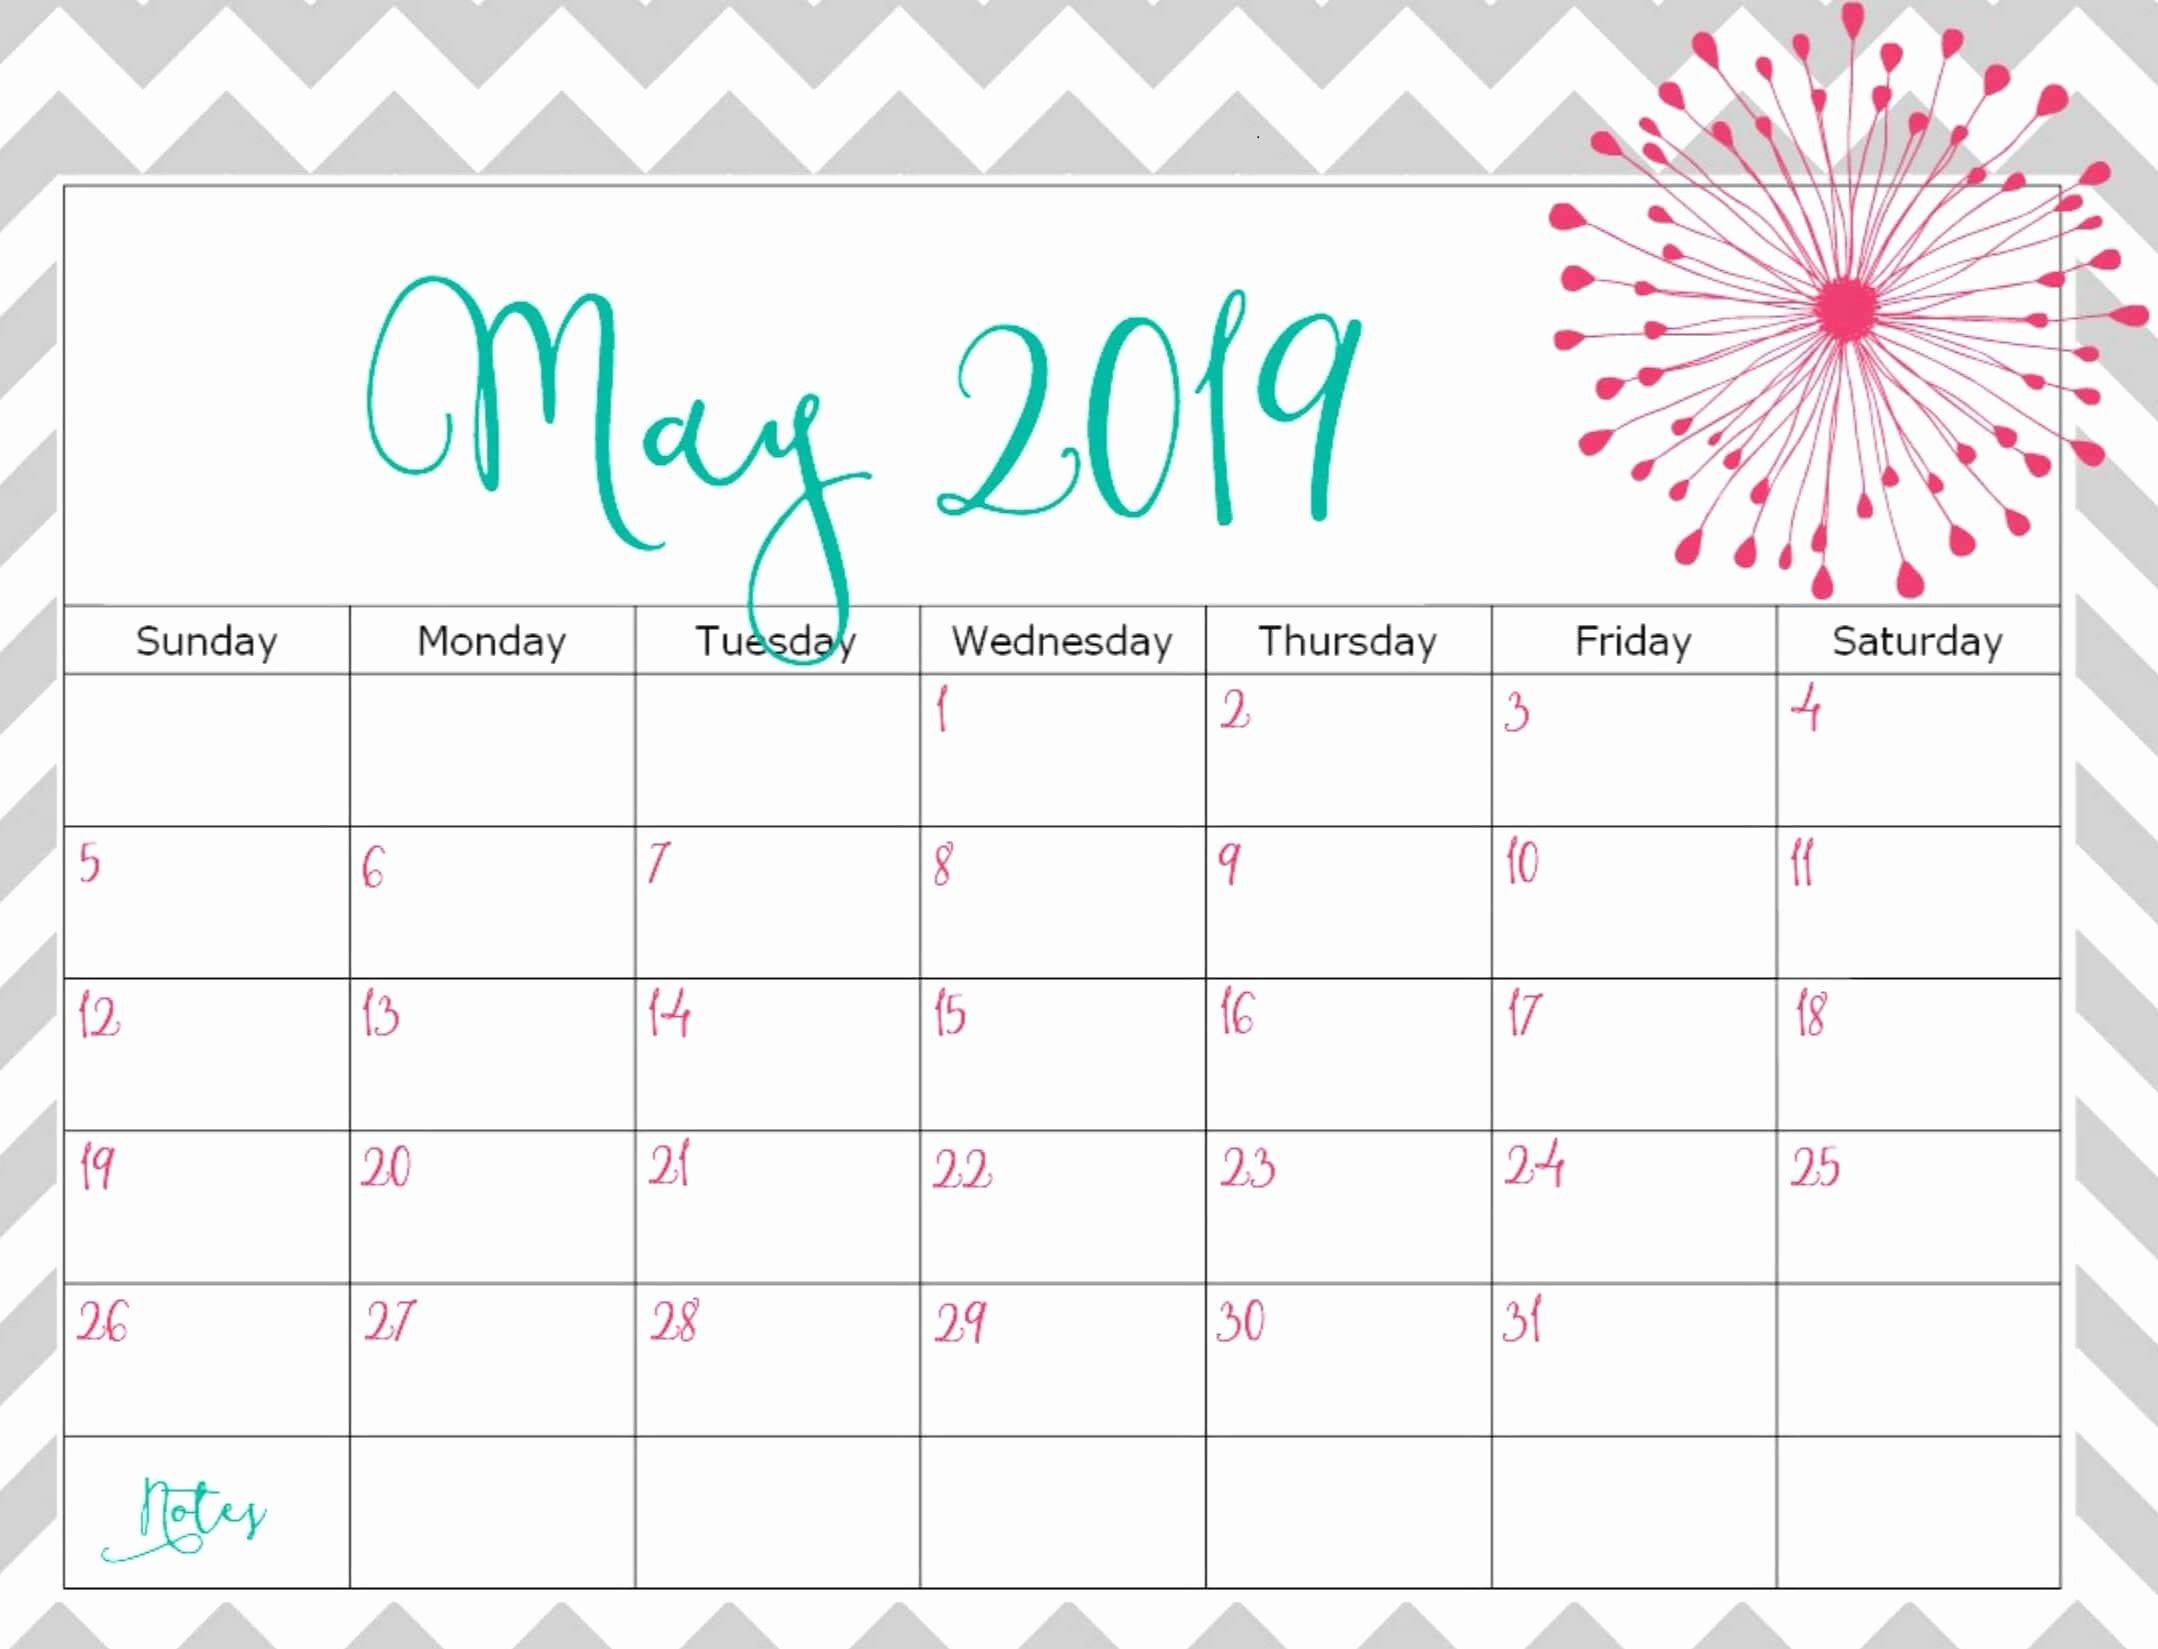 2019 Cute Calendar Printable Fresh Cute May 2019 Calendar Printable for Kids